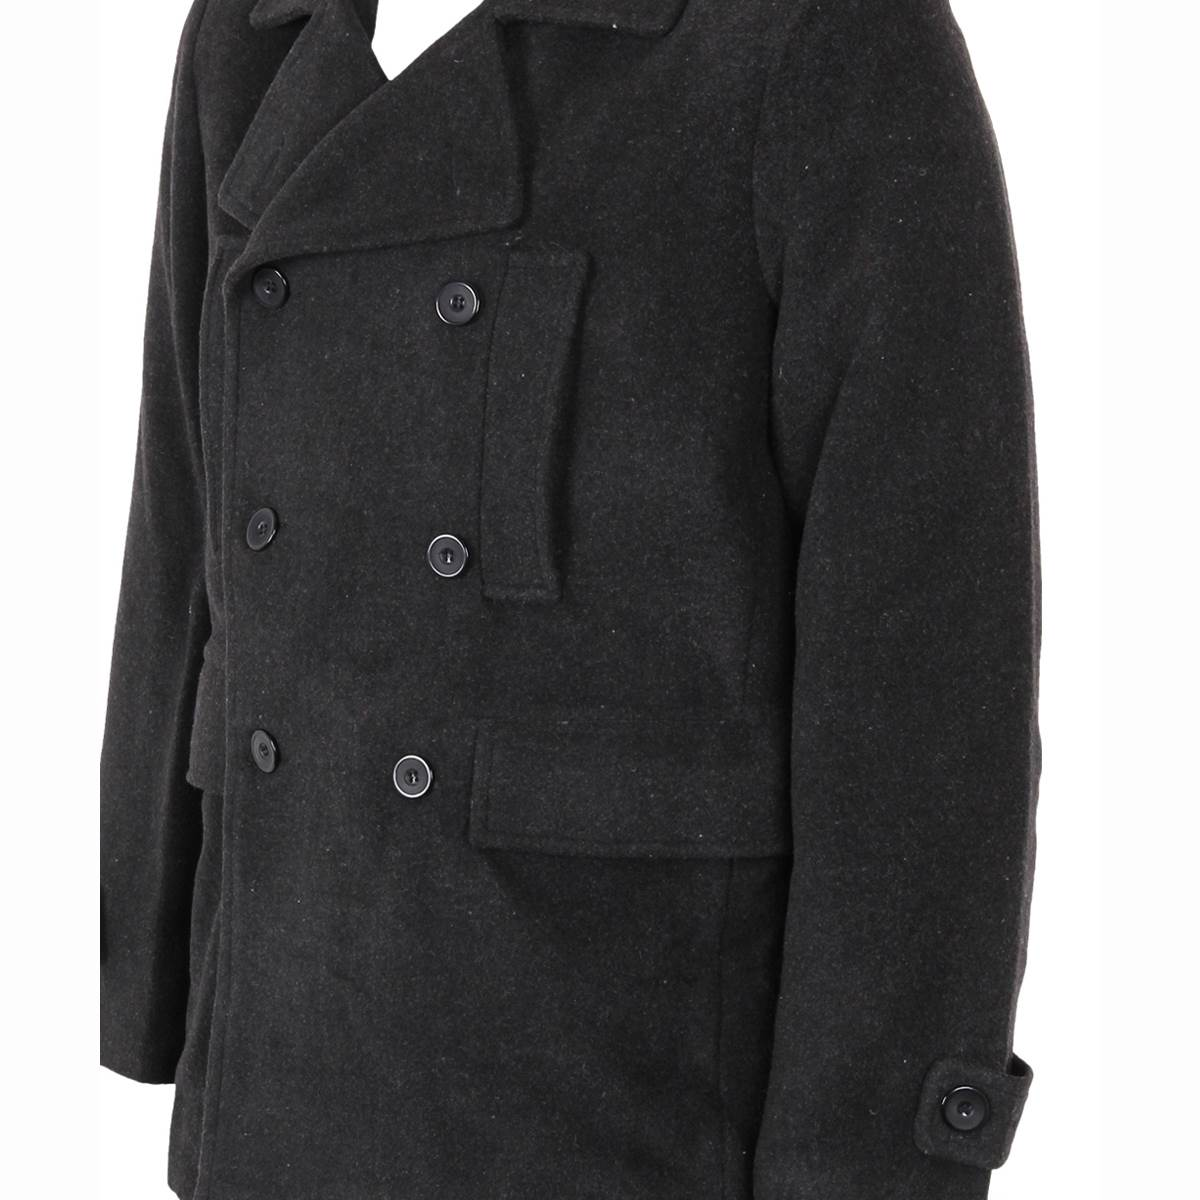 herren schwarze winterjacke pea coat caban jacke zweireiher mantel wolljacke ebay. Black Bedroom Furniture Sets. Home Design Ideas